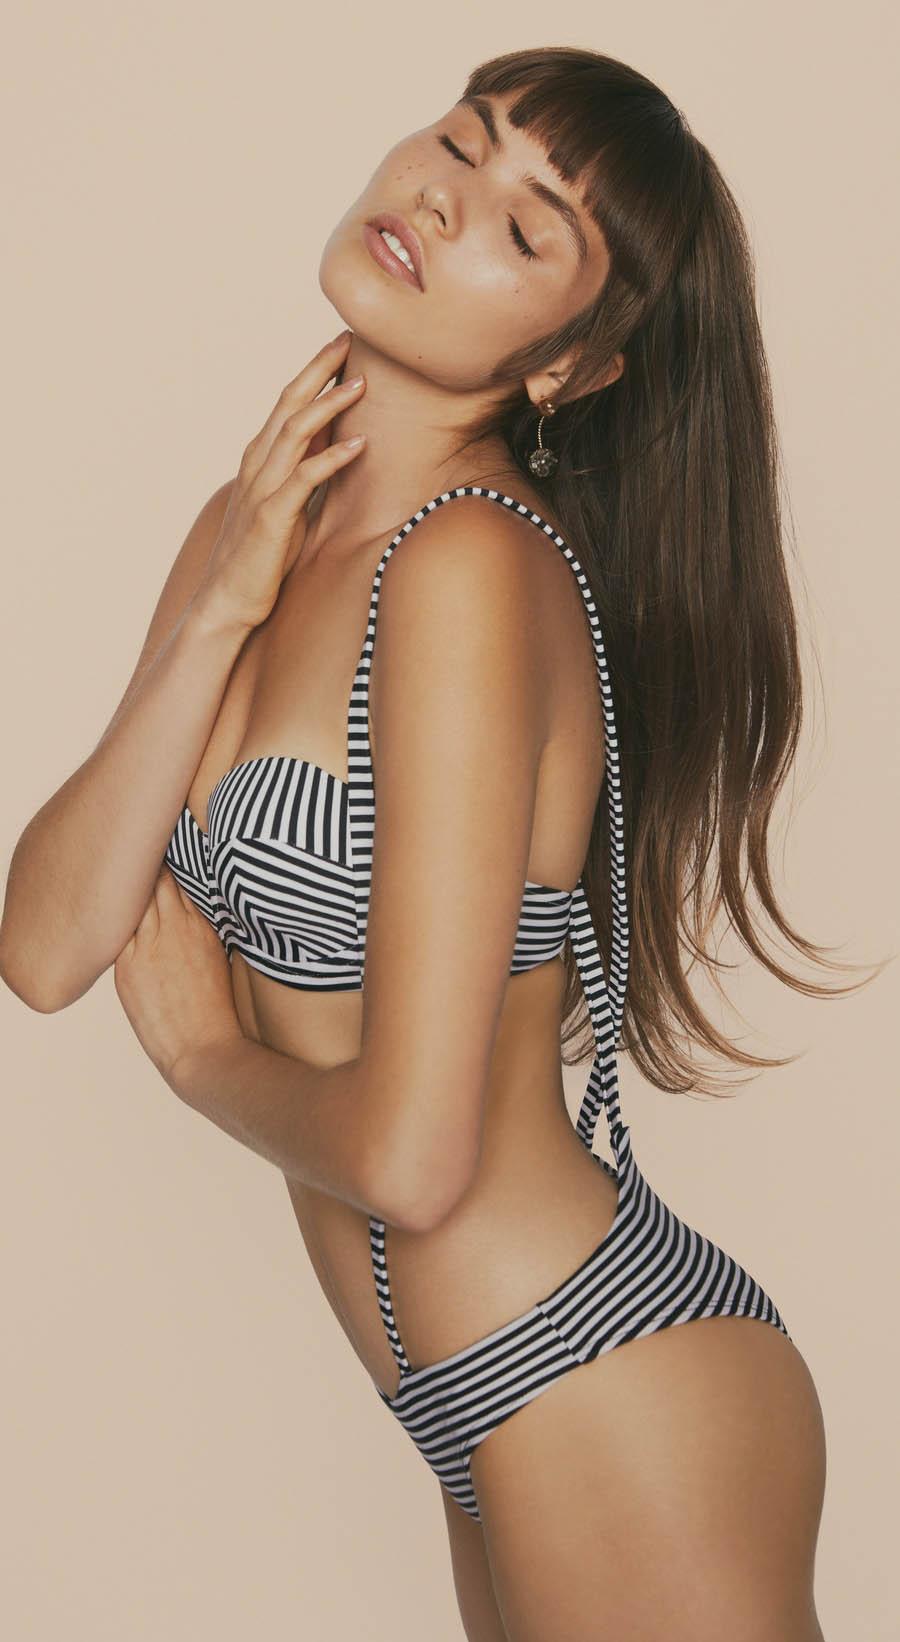 Audrina Patridge, Prey Swim Resort Wear Swimsuit Line, Celebrity Clothing Brand, Miaou Bustier Top, Duck Dive Bottoms